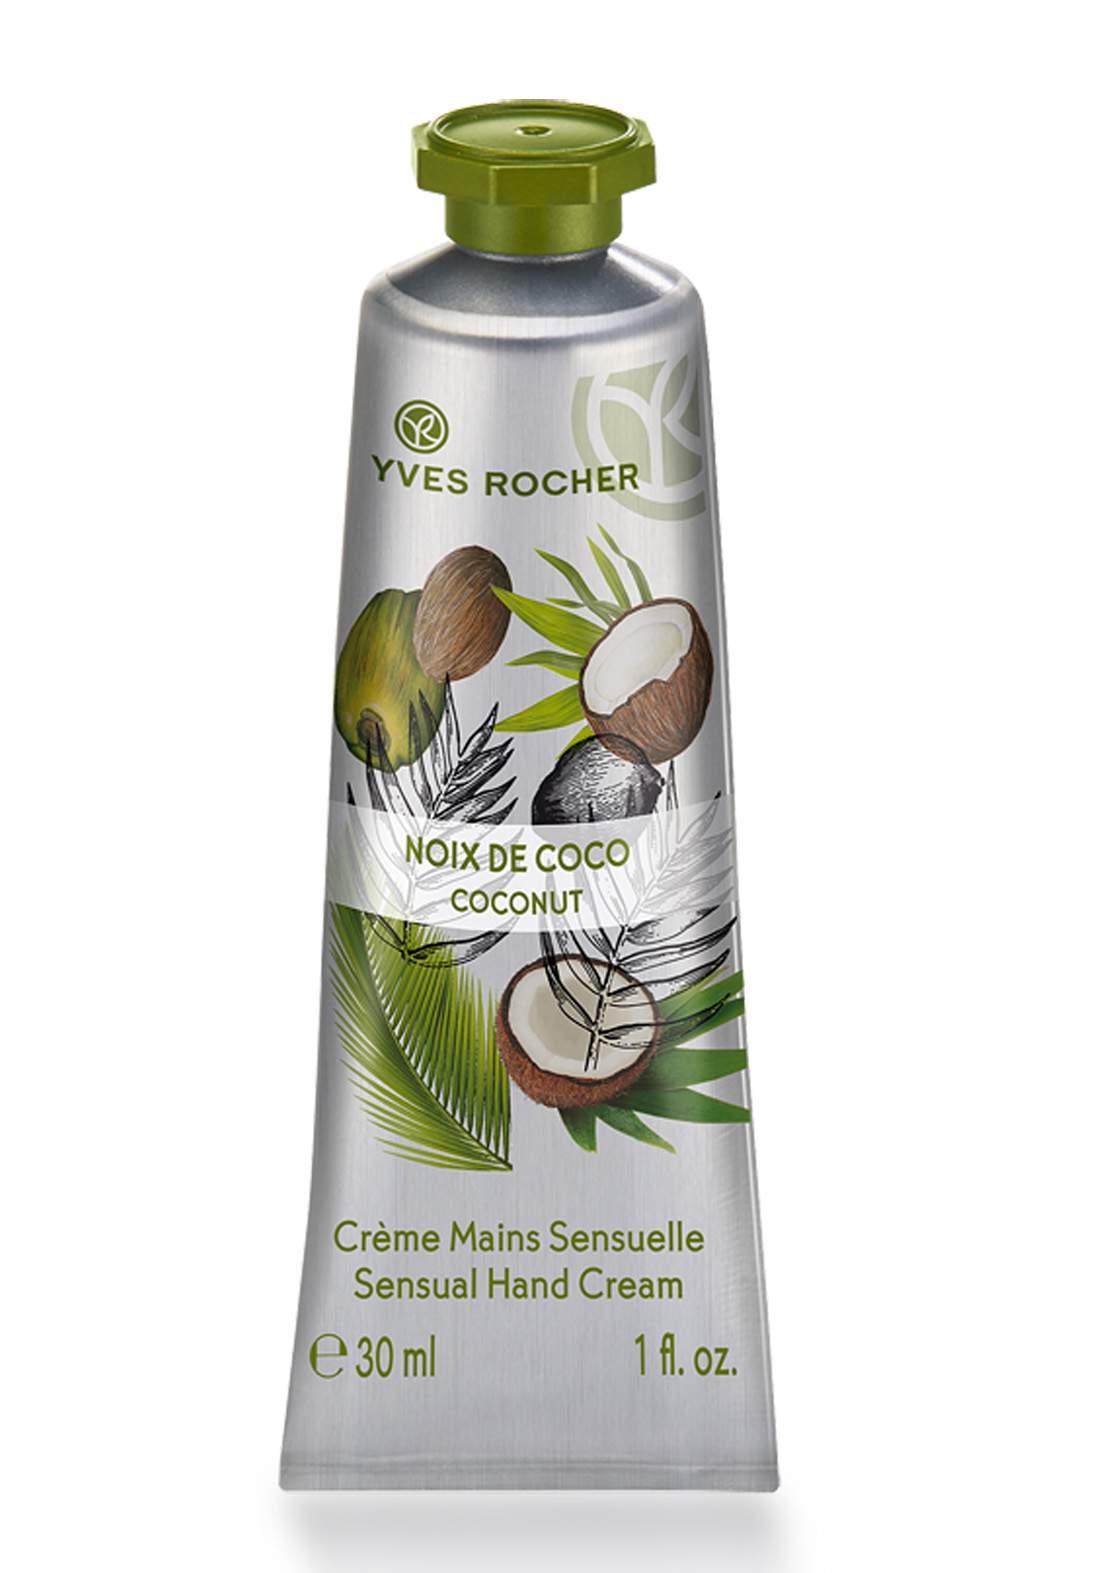 Yves Rocher 27300 Sensual Hand Cream Coconut Moisturising Cream 30 ml  كريم مرطب لليدين